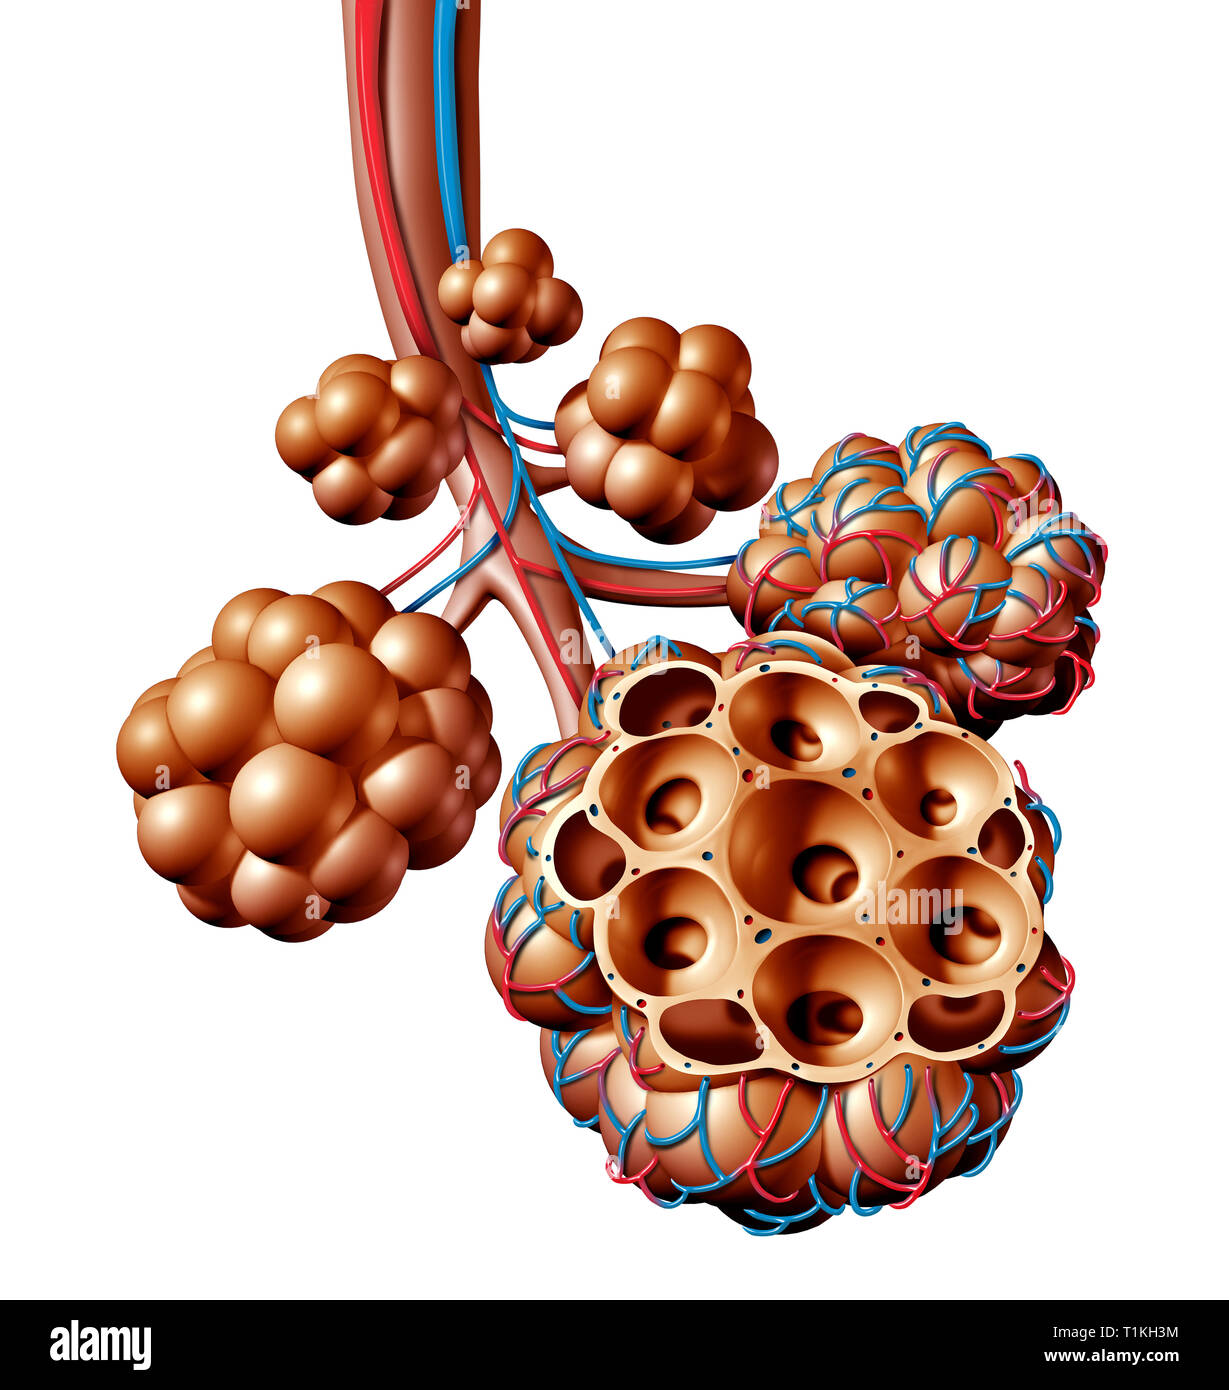 Pulmonary alveoli or alveolus anatomy diagram as a medical concept of a lung anatomy and respiratory and respiration medicine. - Stock Image